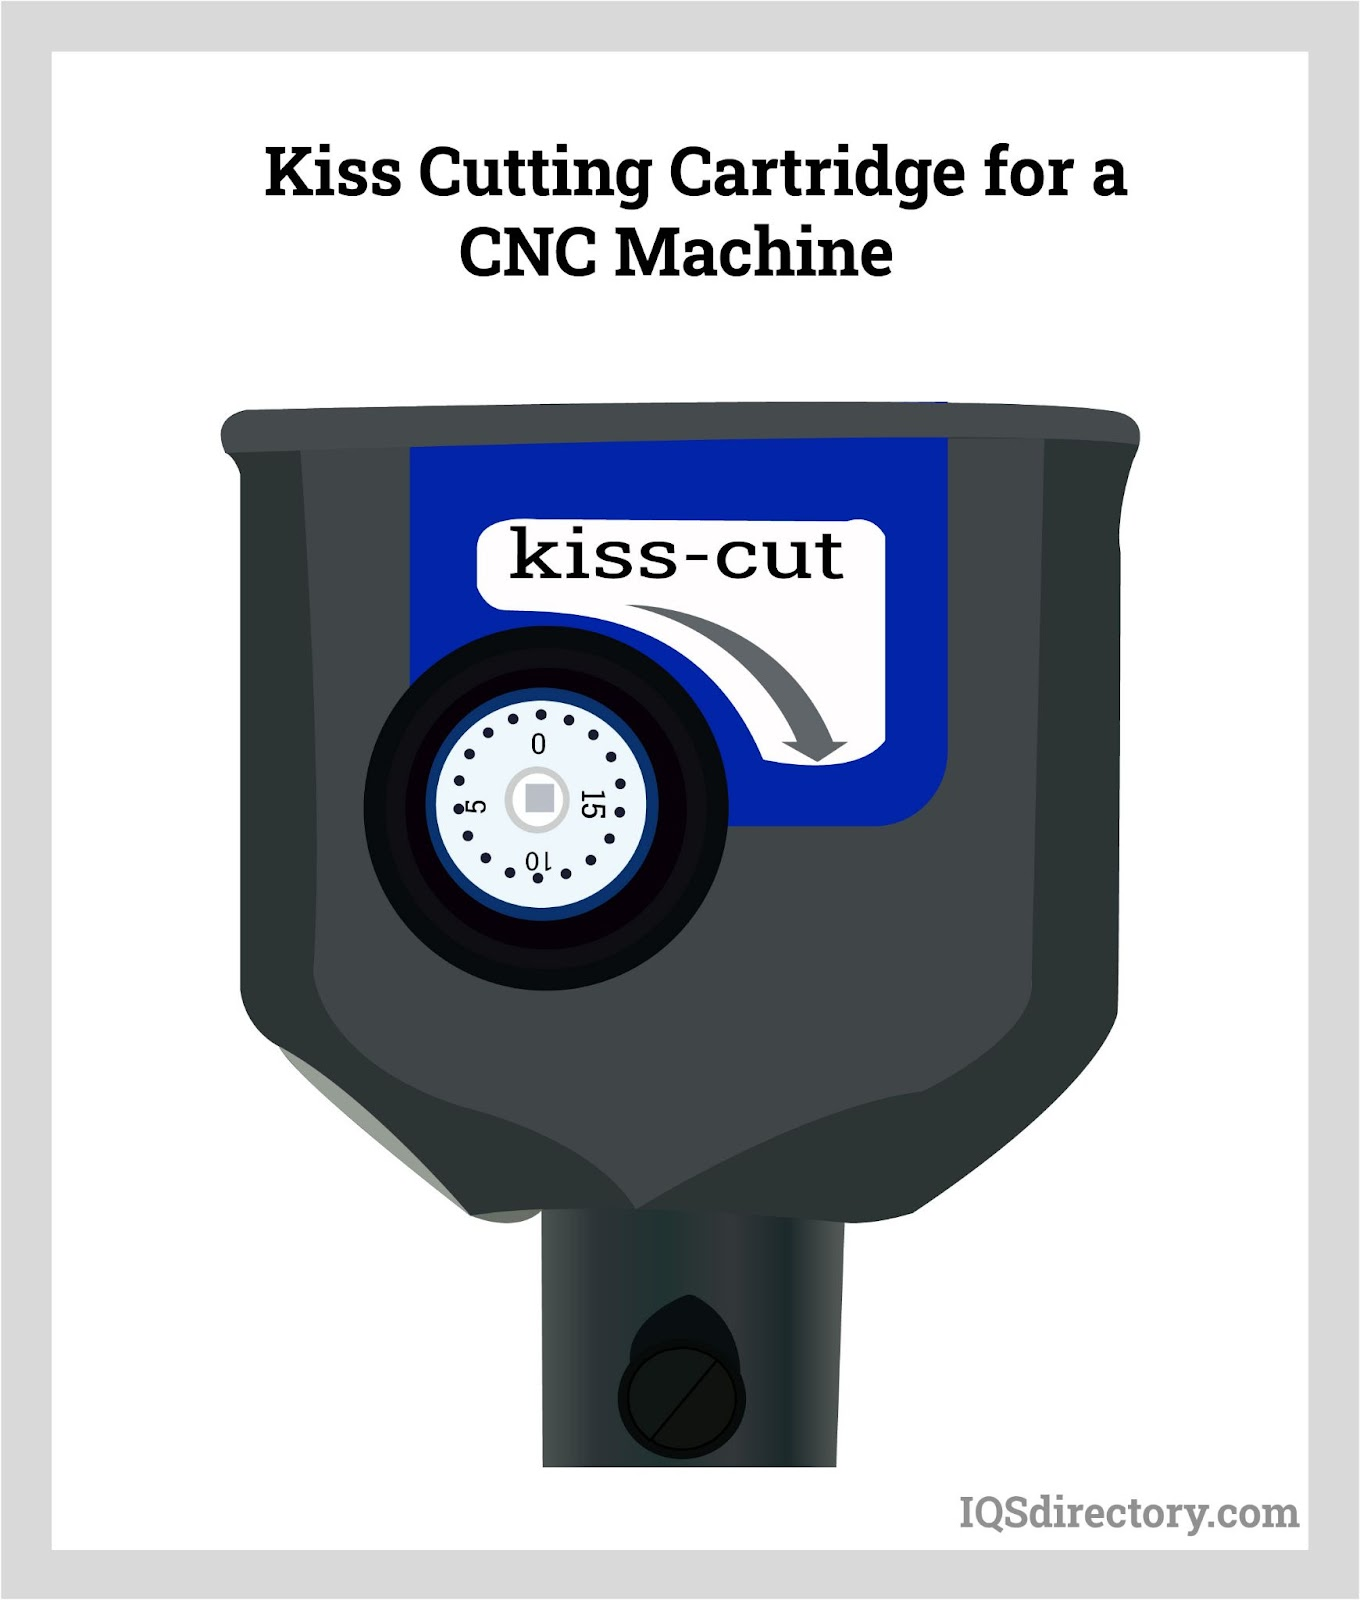 Kiss Cutting Cartridge for a CNC Machine